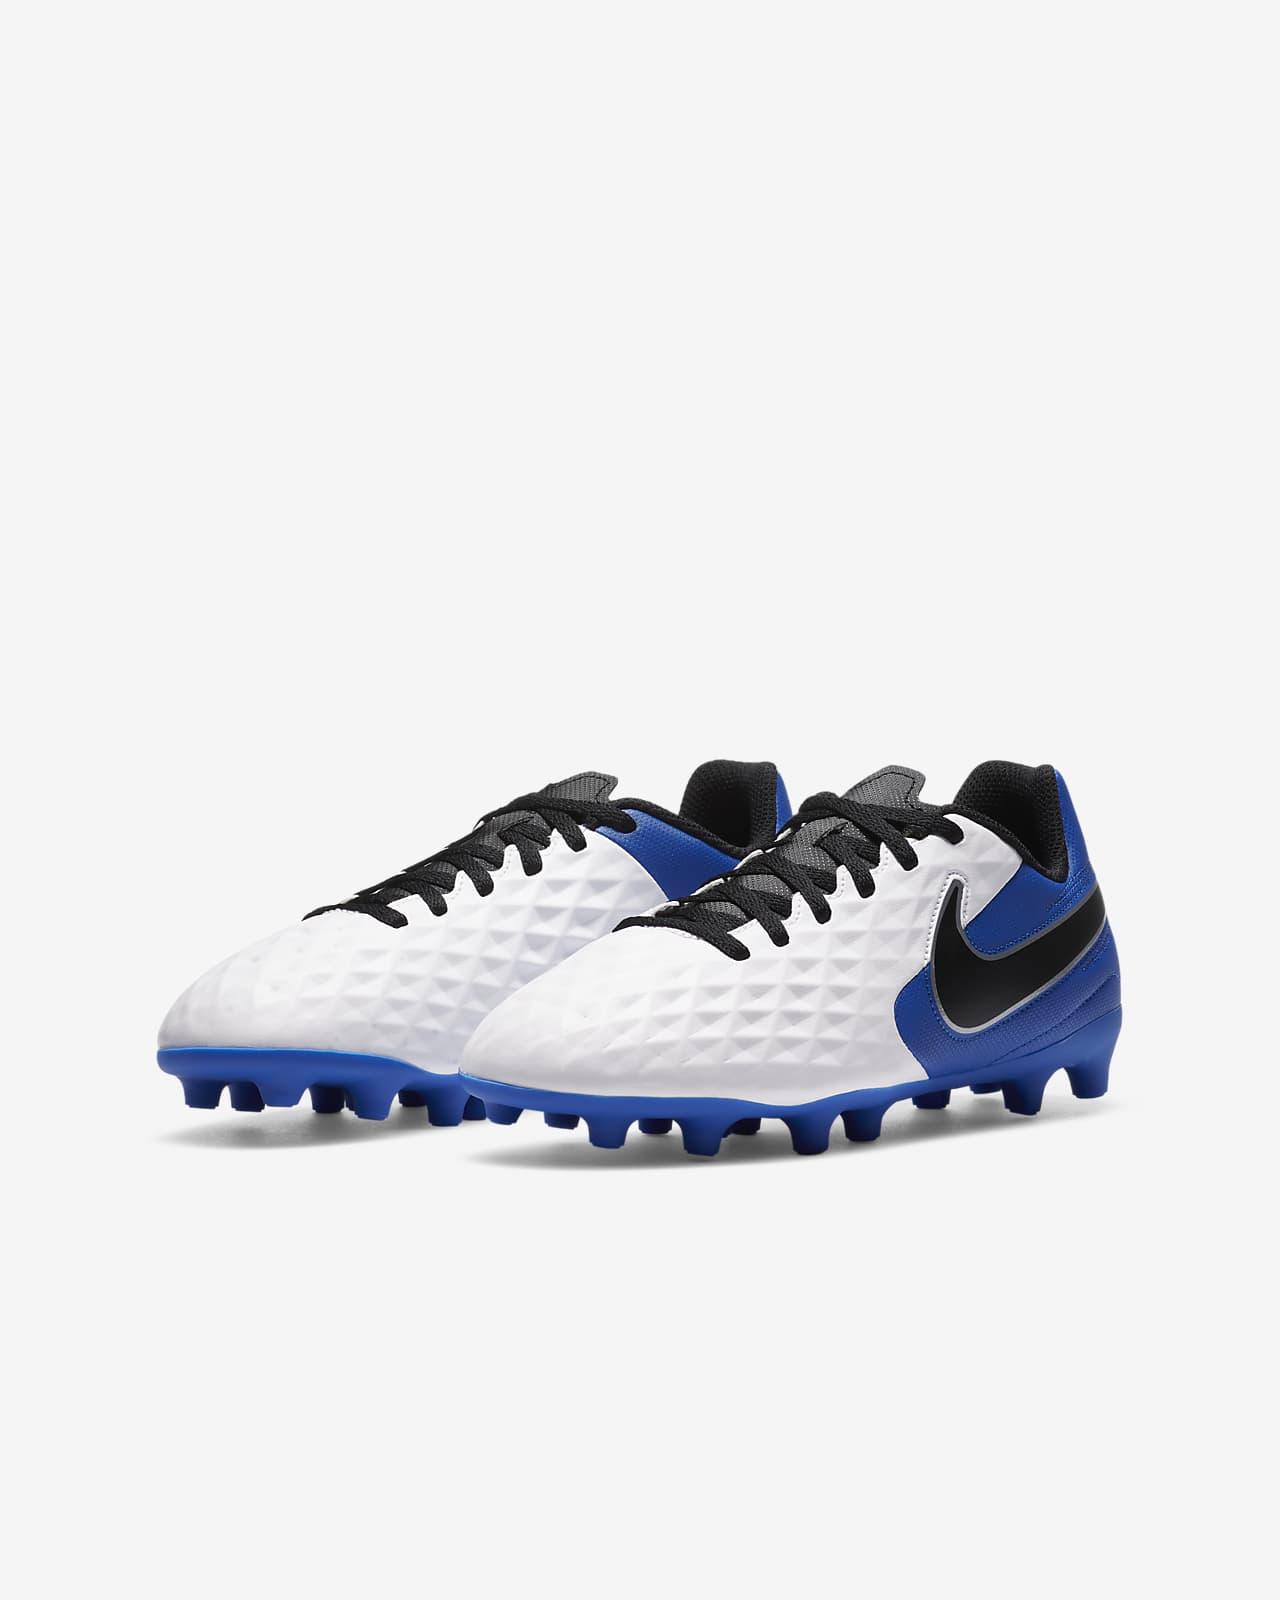 Nike Tiempo Legend 8 Club MG fotballsko for flere underlag